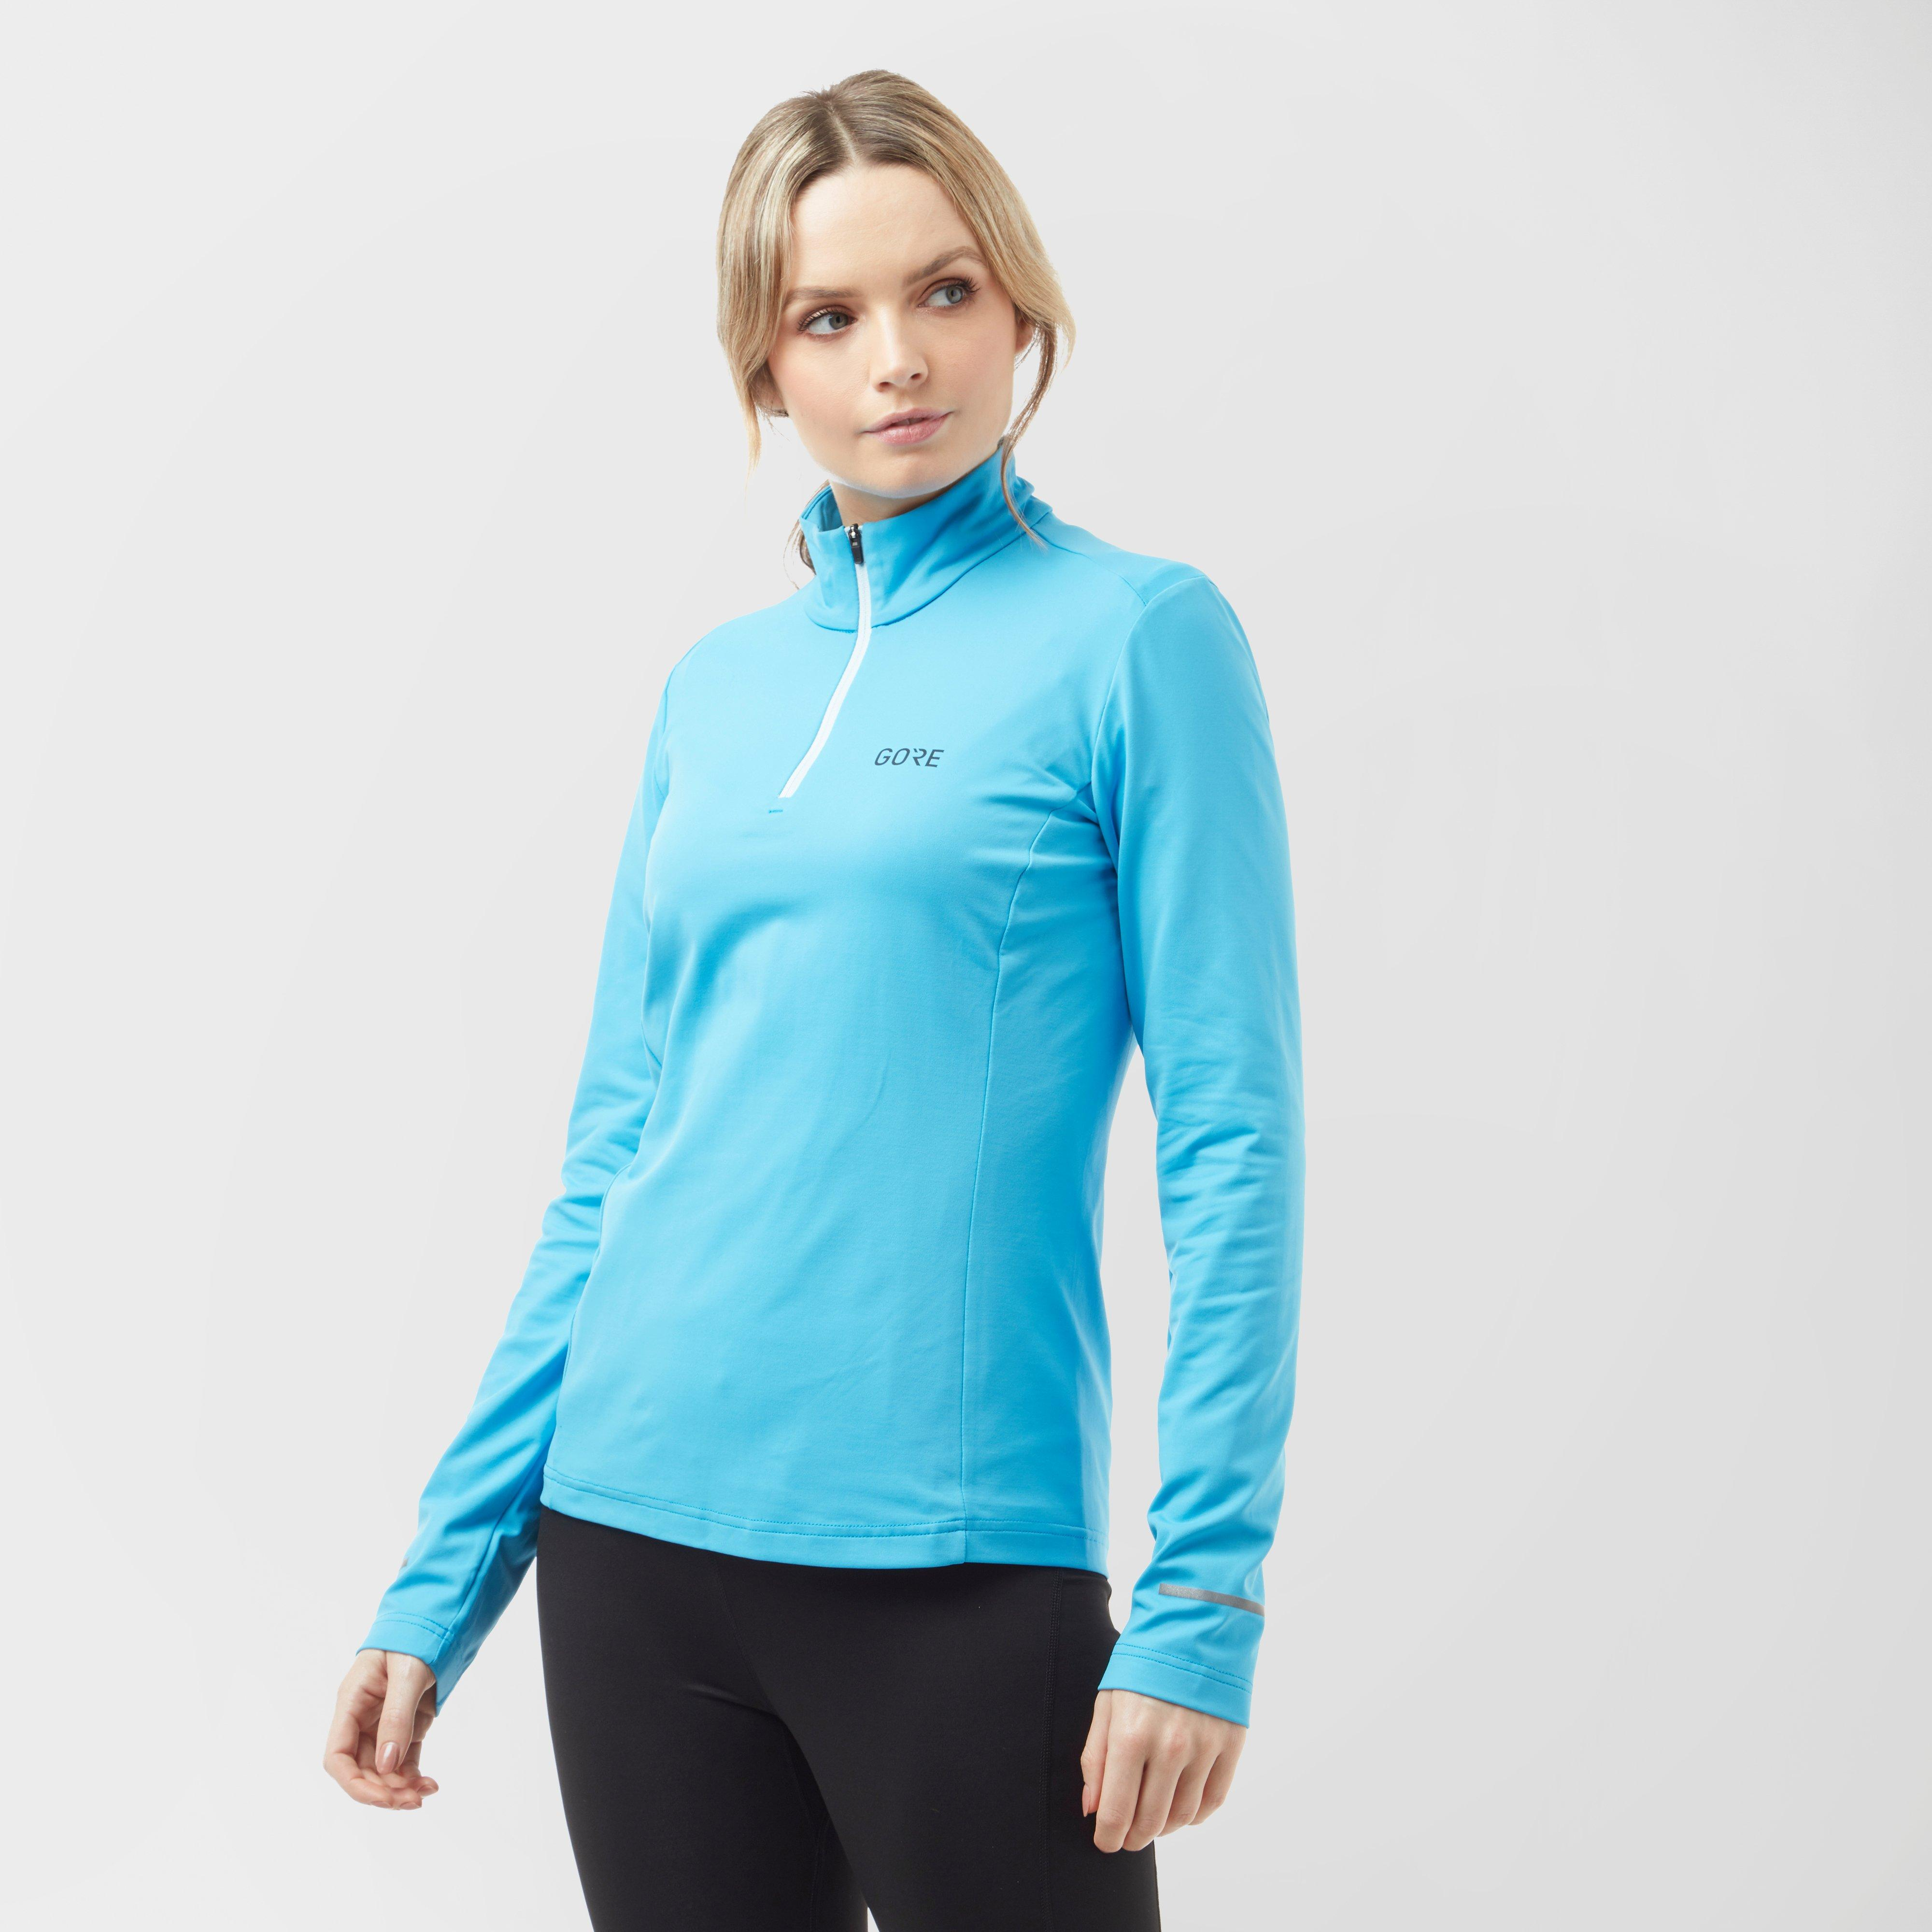 Gore Women's R3 Long Sleeve ¼ Zip Shirt - Mbl/Mbl, MBL/MBL